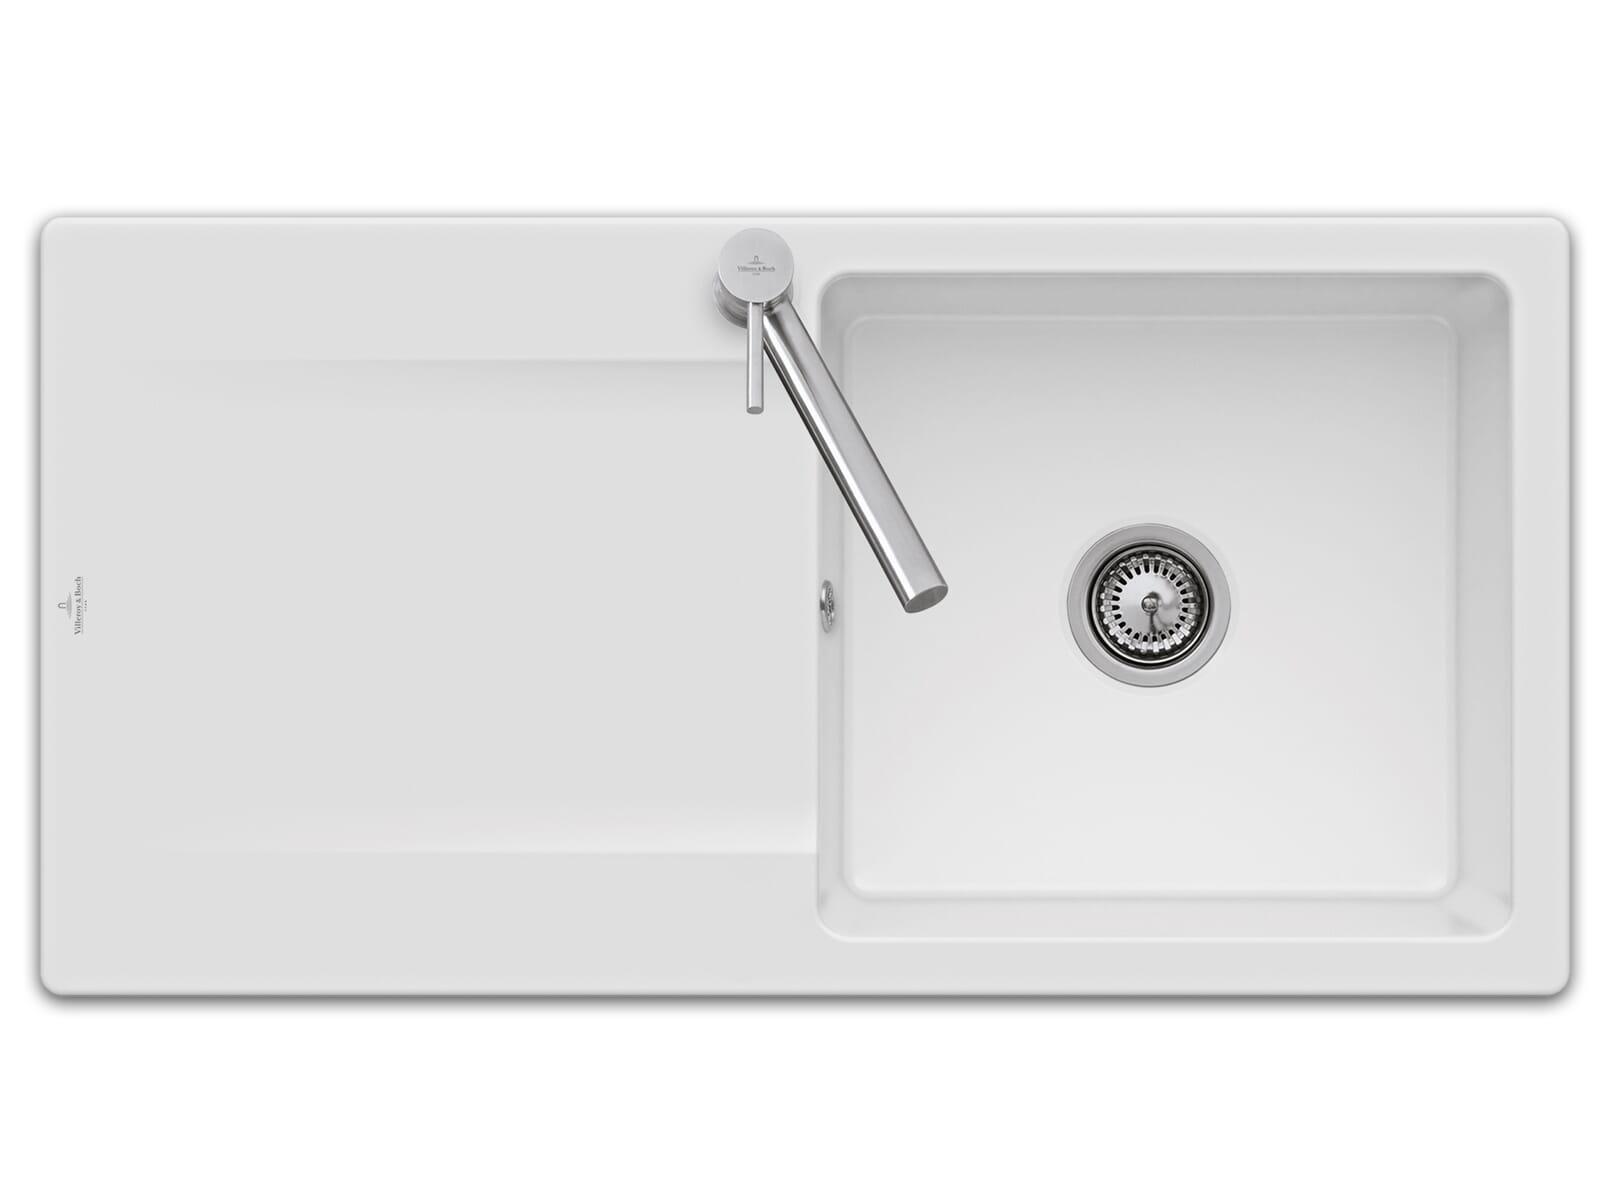 Villeroy & Boch Siluet 60 - 3336 01 KG Snow White Keramikspüle Handbetätigung